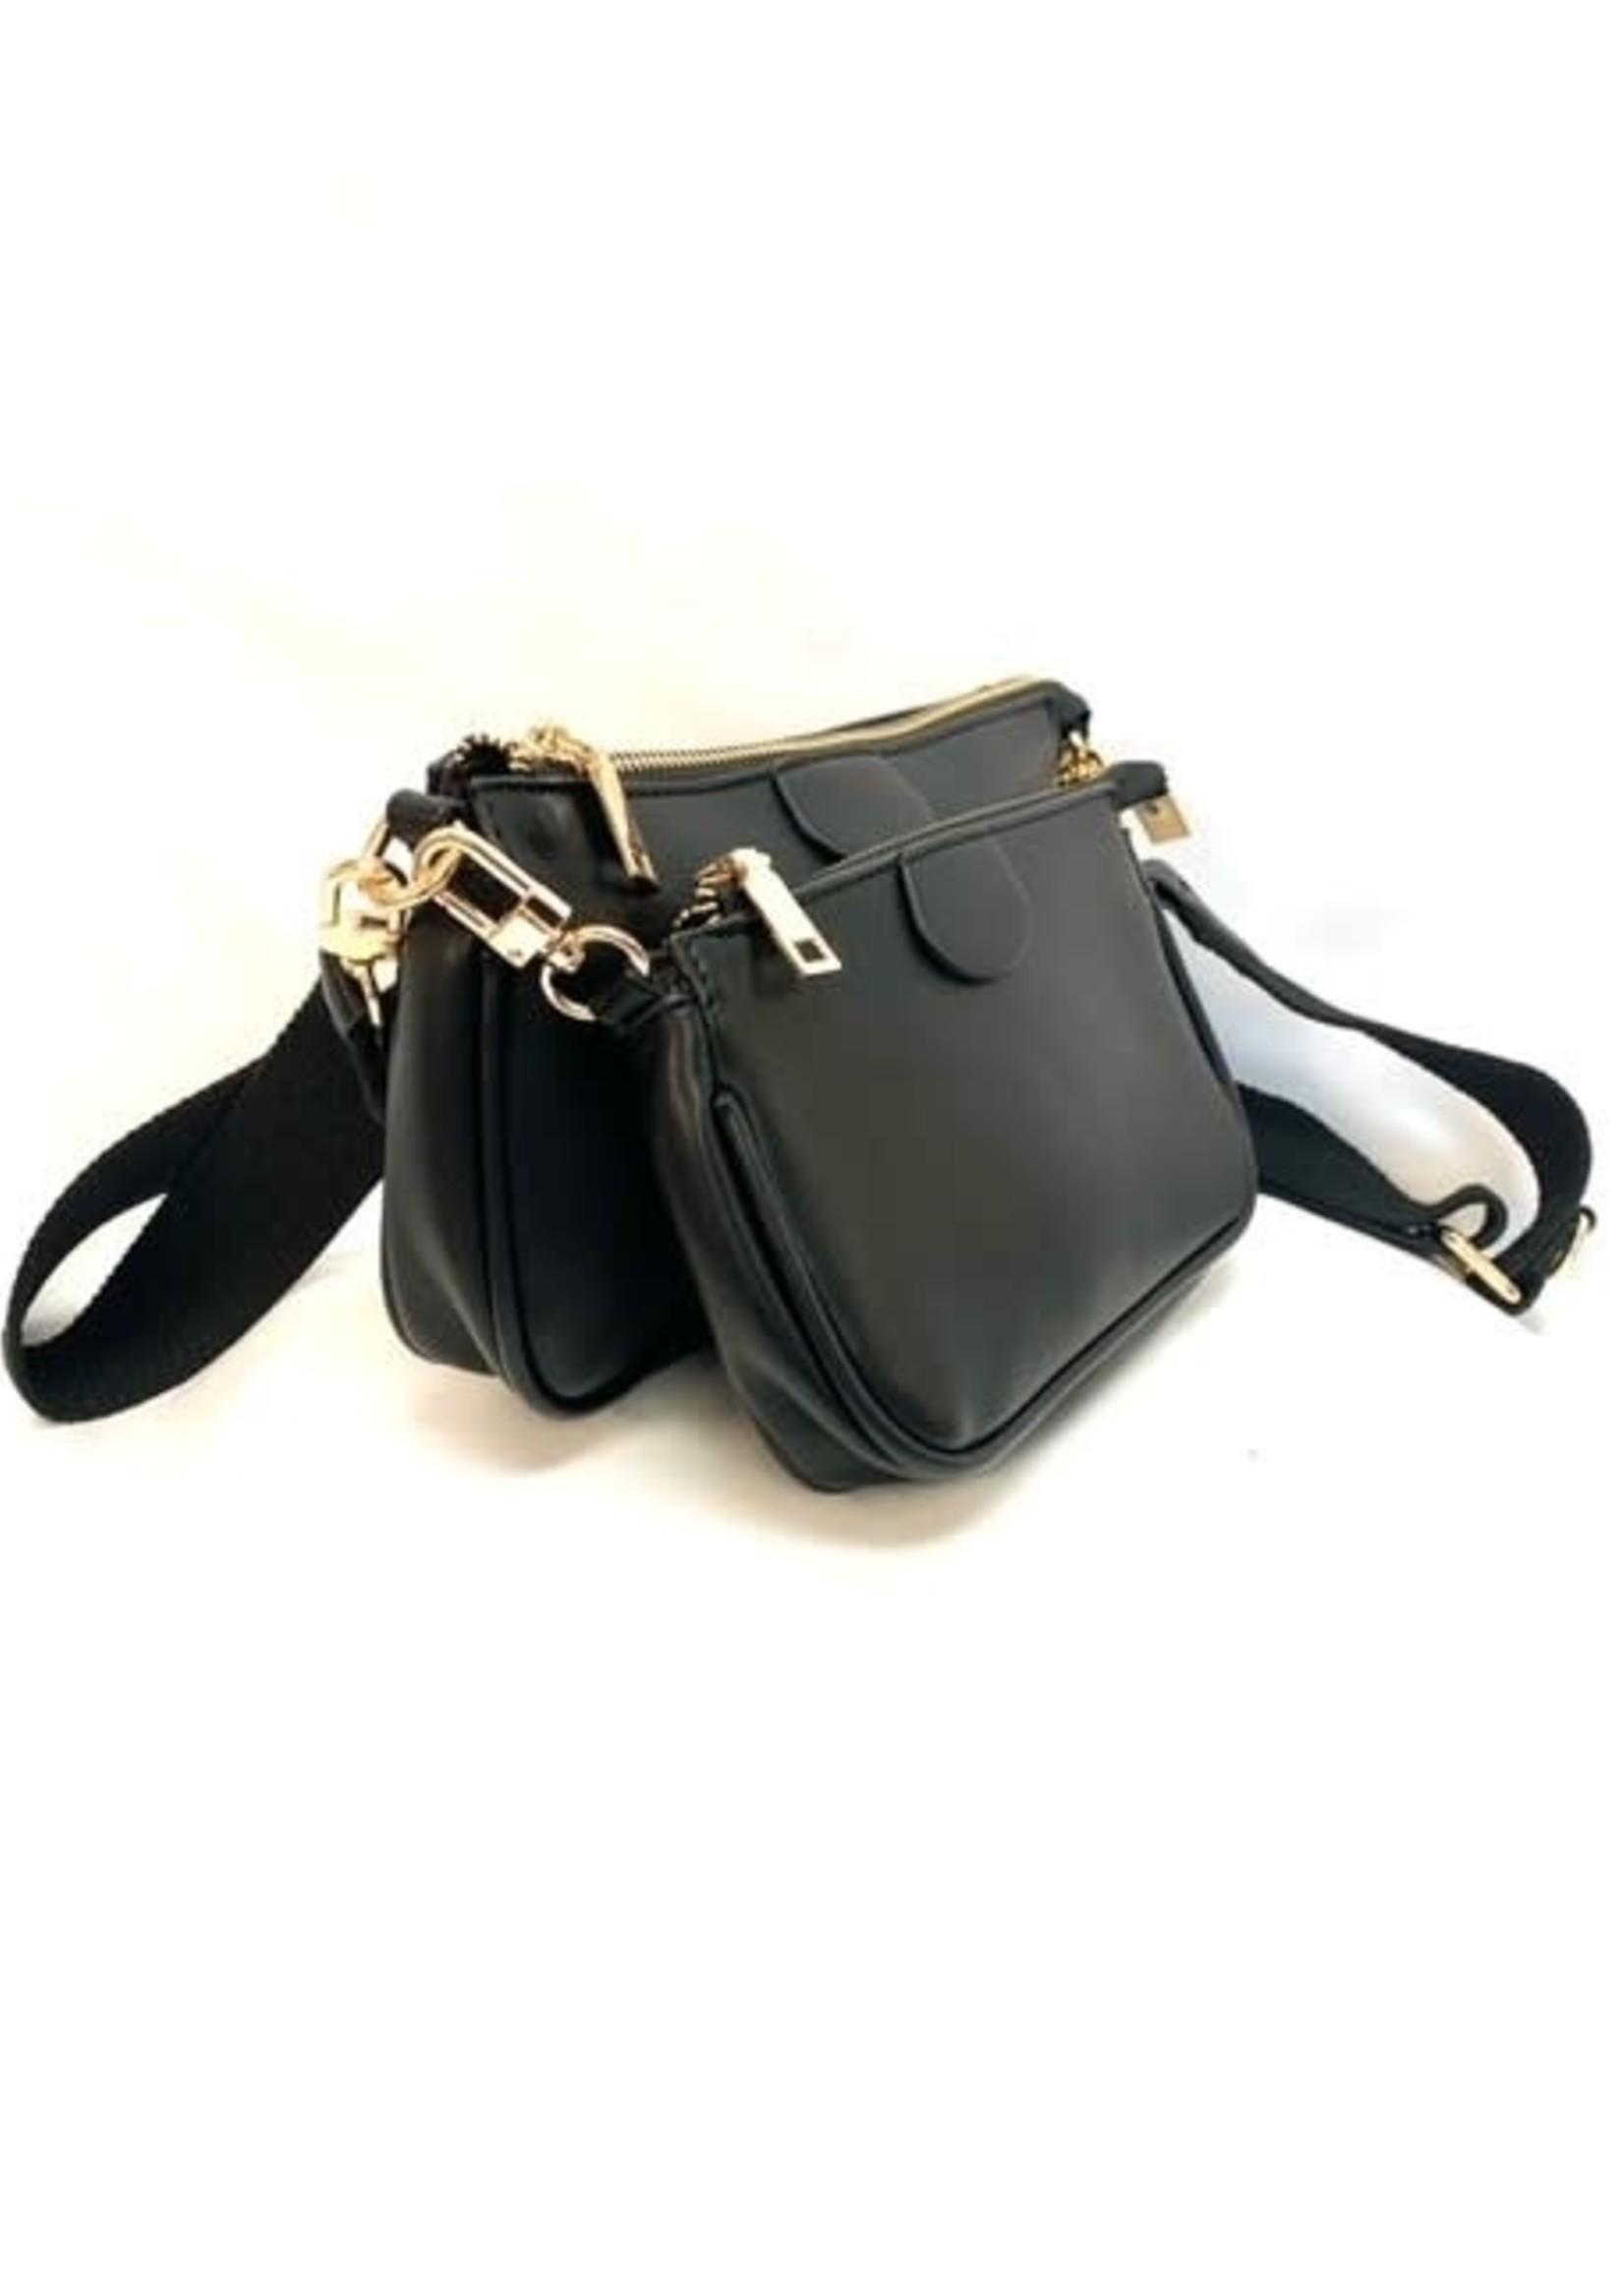 Blush 2 in 1 crossbody purse